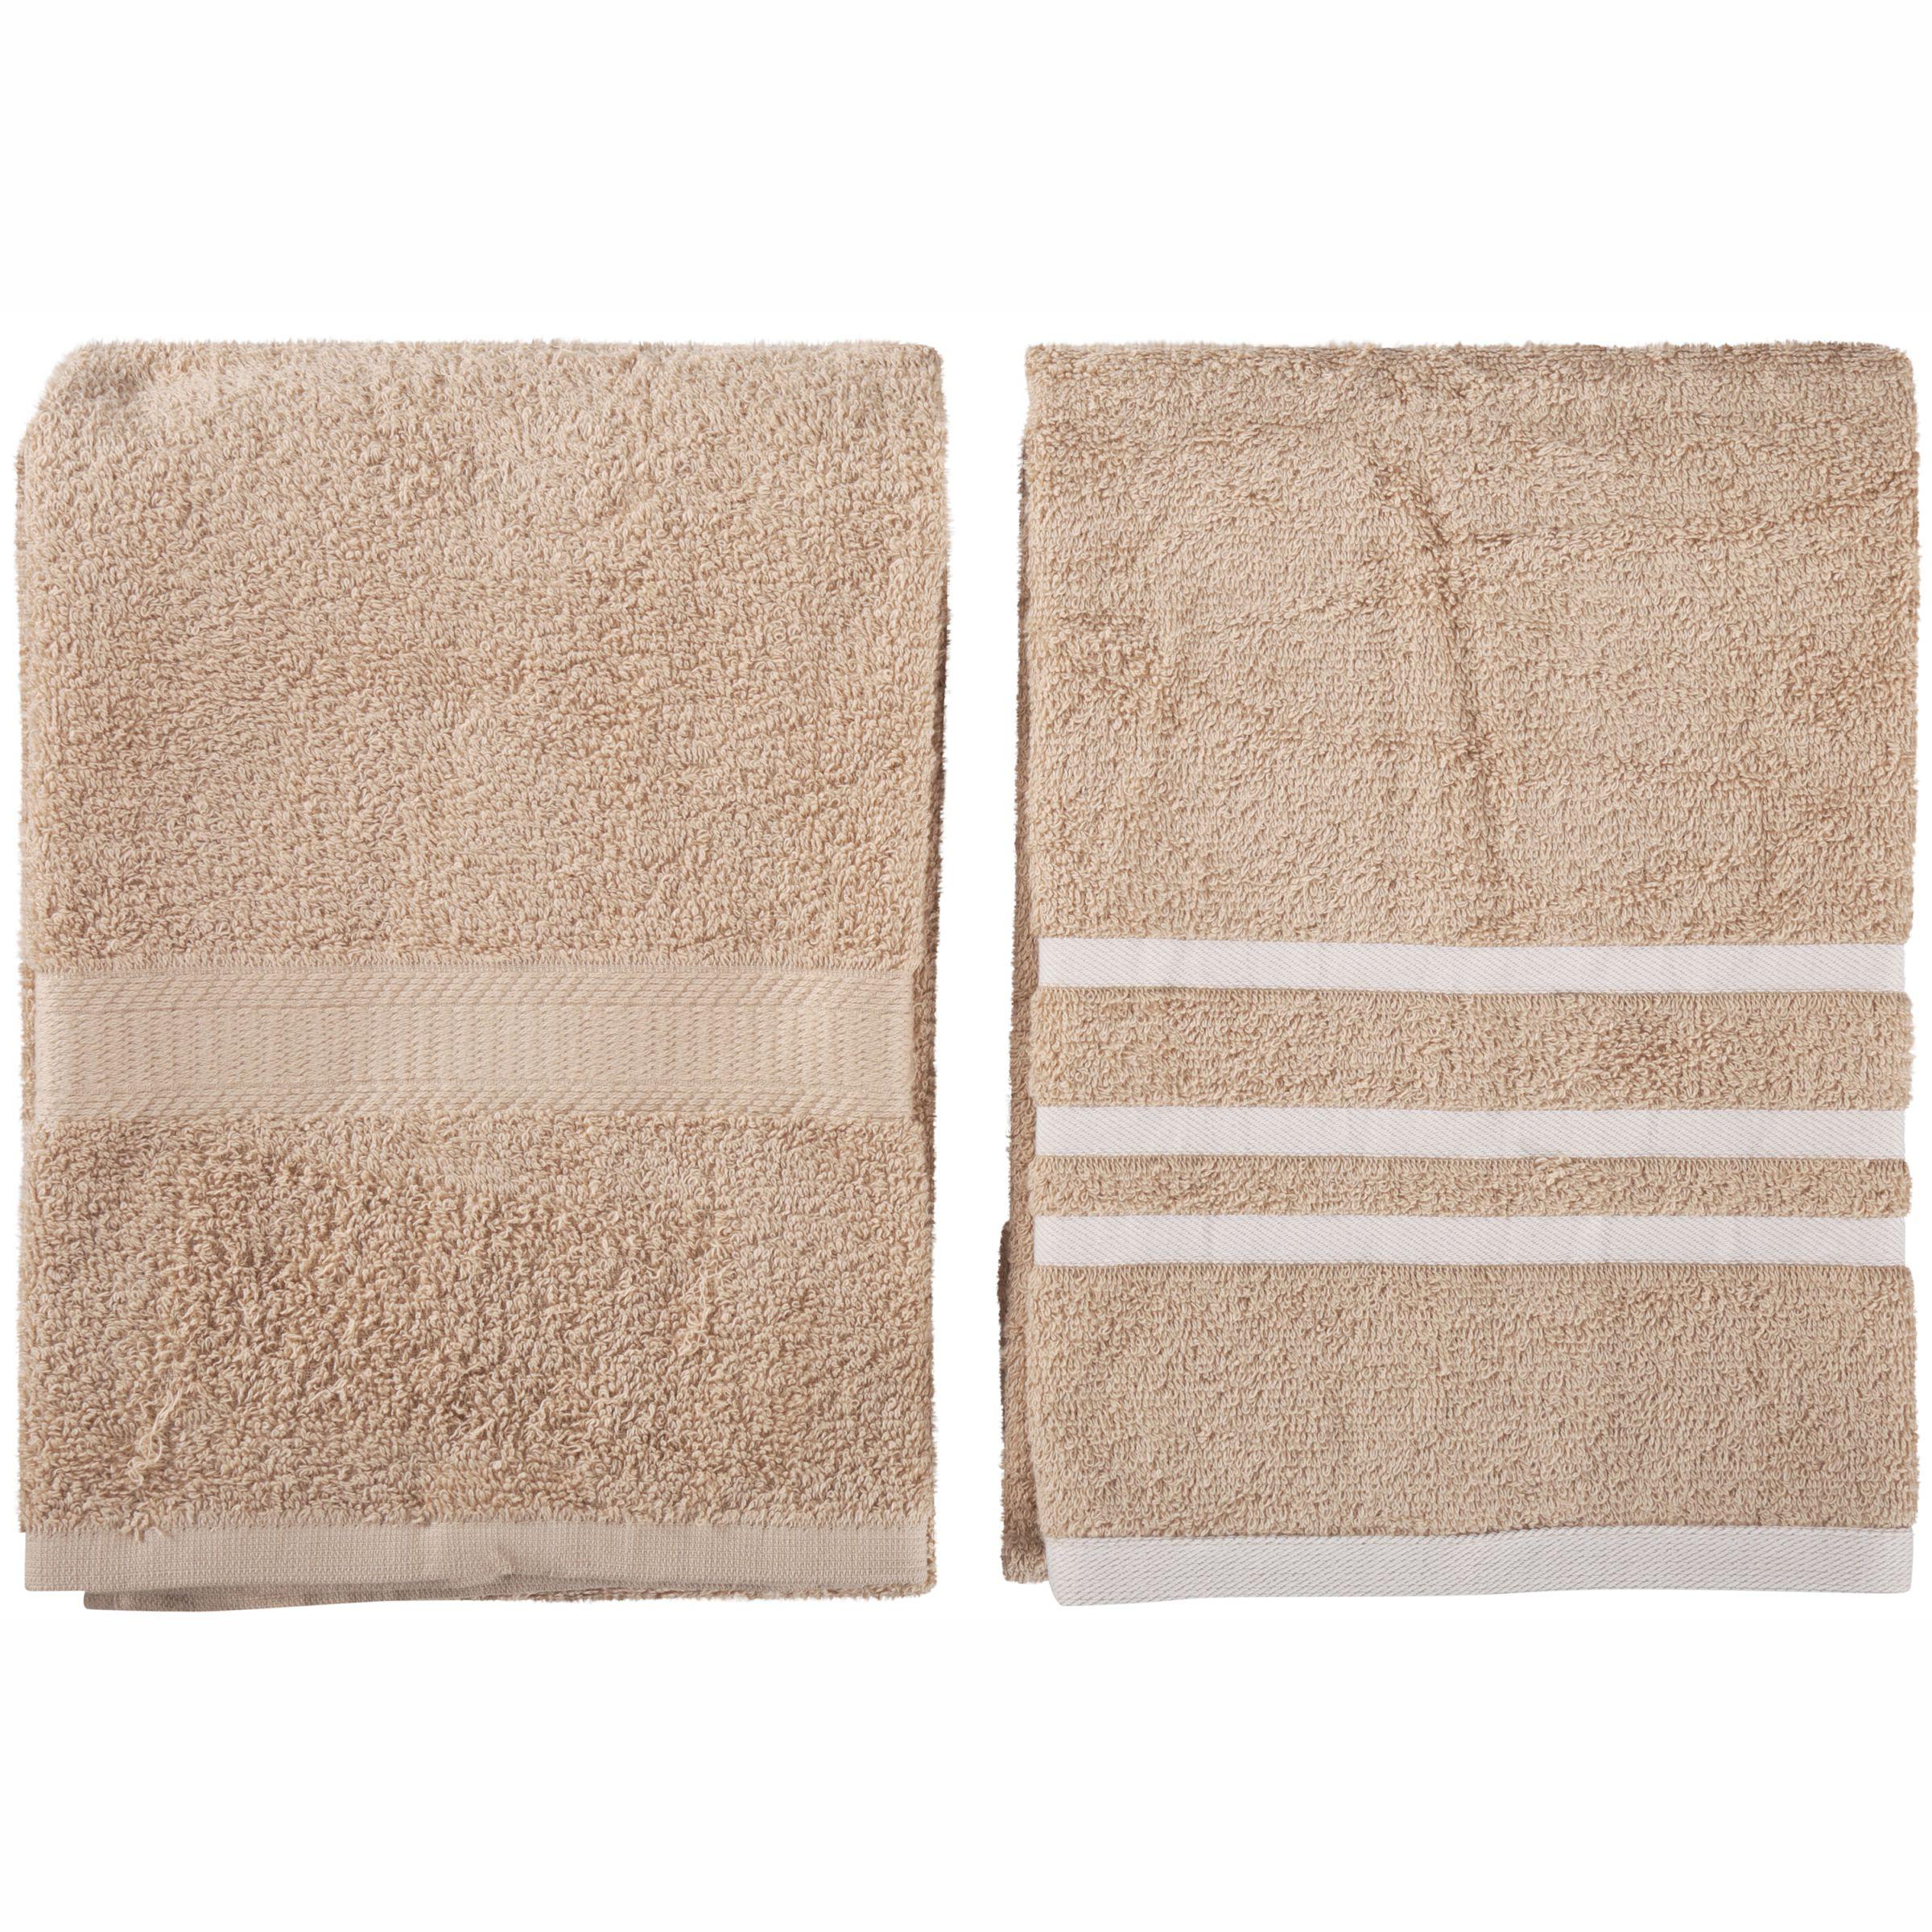 Mainstays™ Bath Towels 4 ct Pack